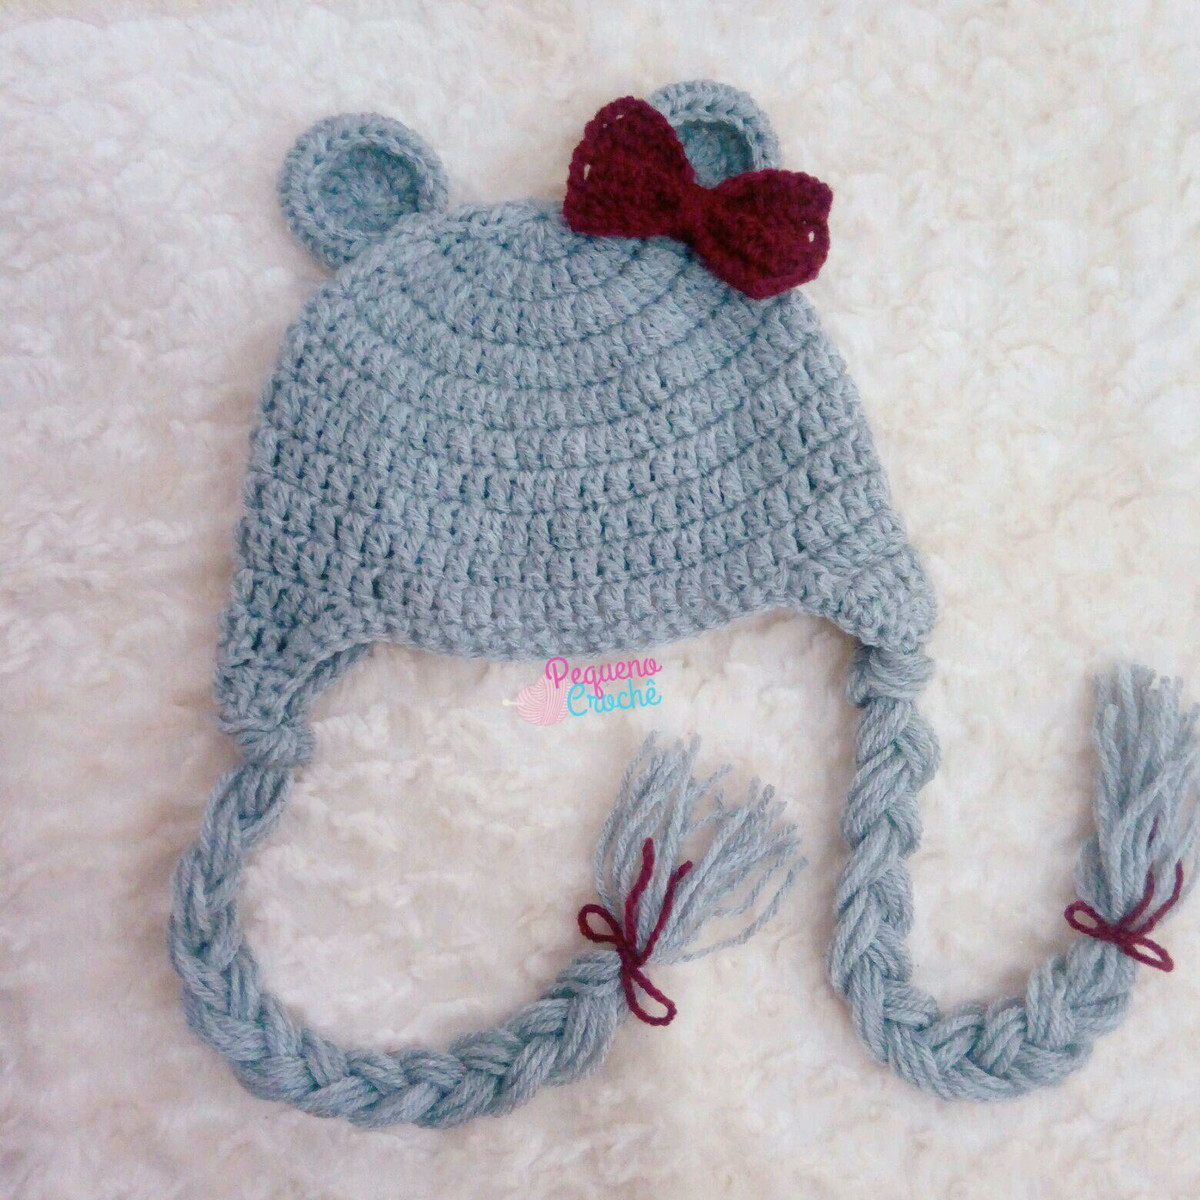 58c63b47a6aa1 Touca Croche Infantil Urso no Elo7